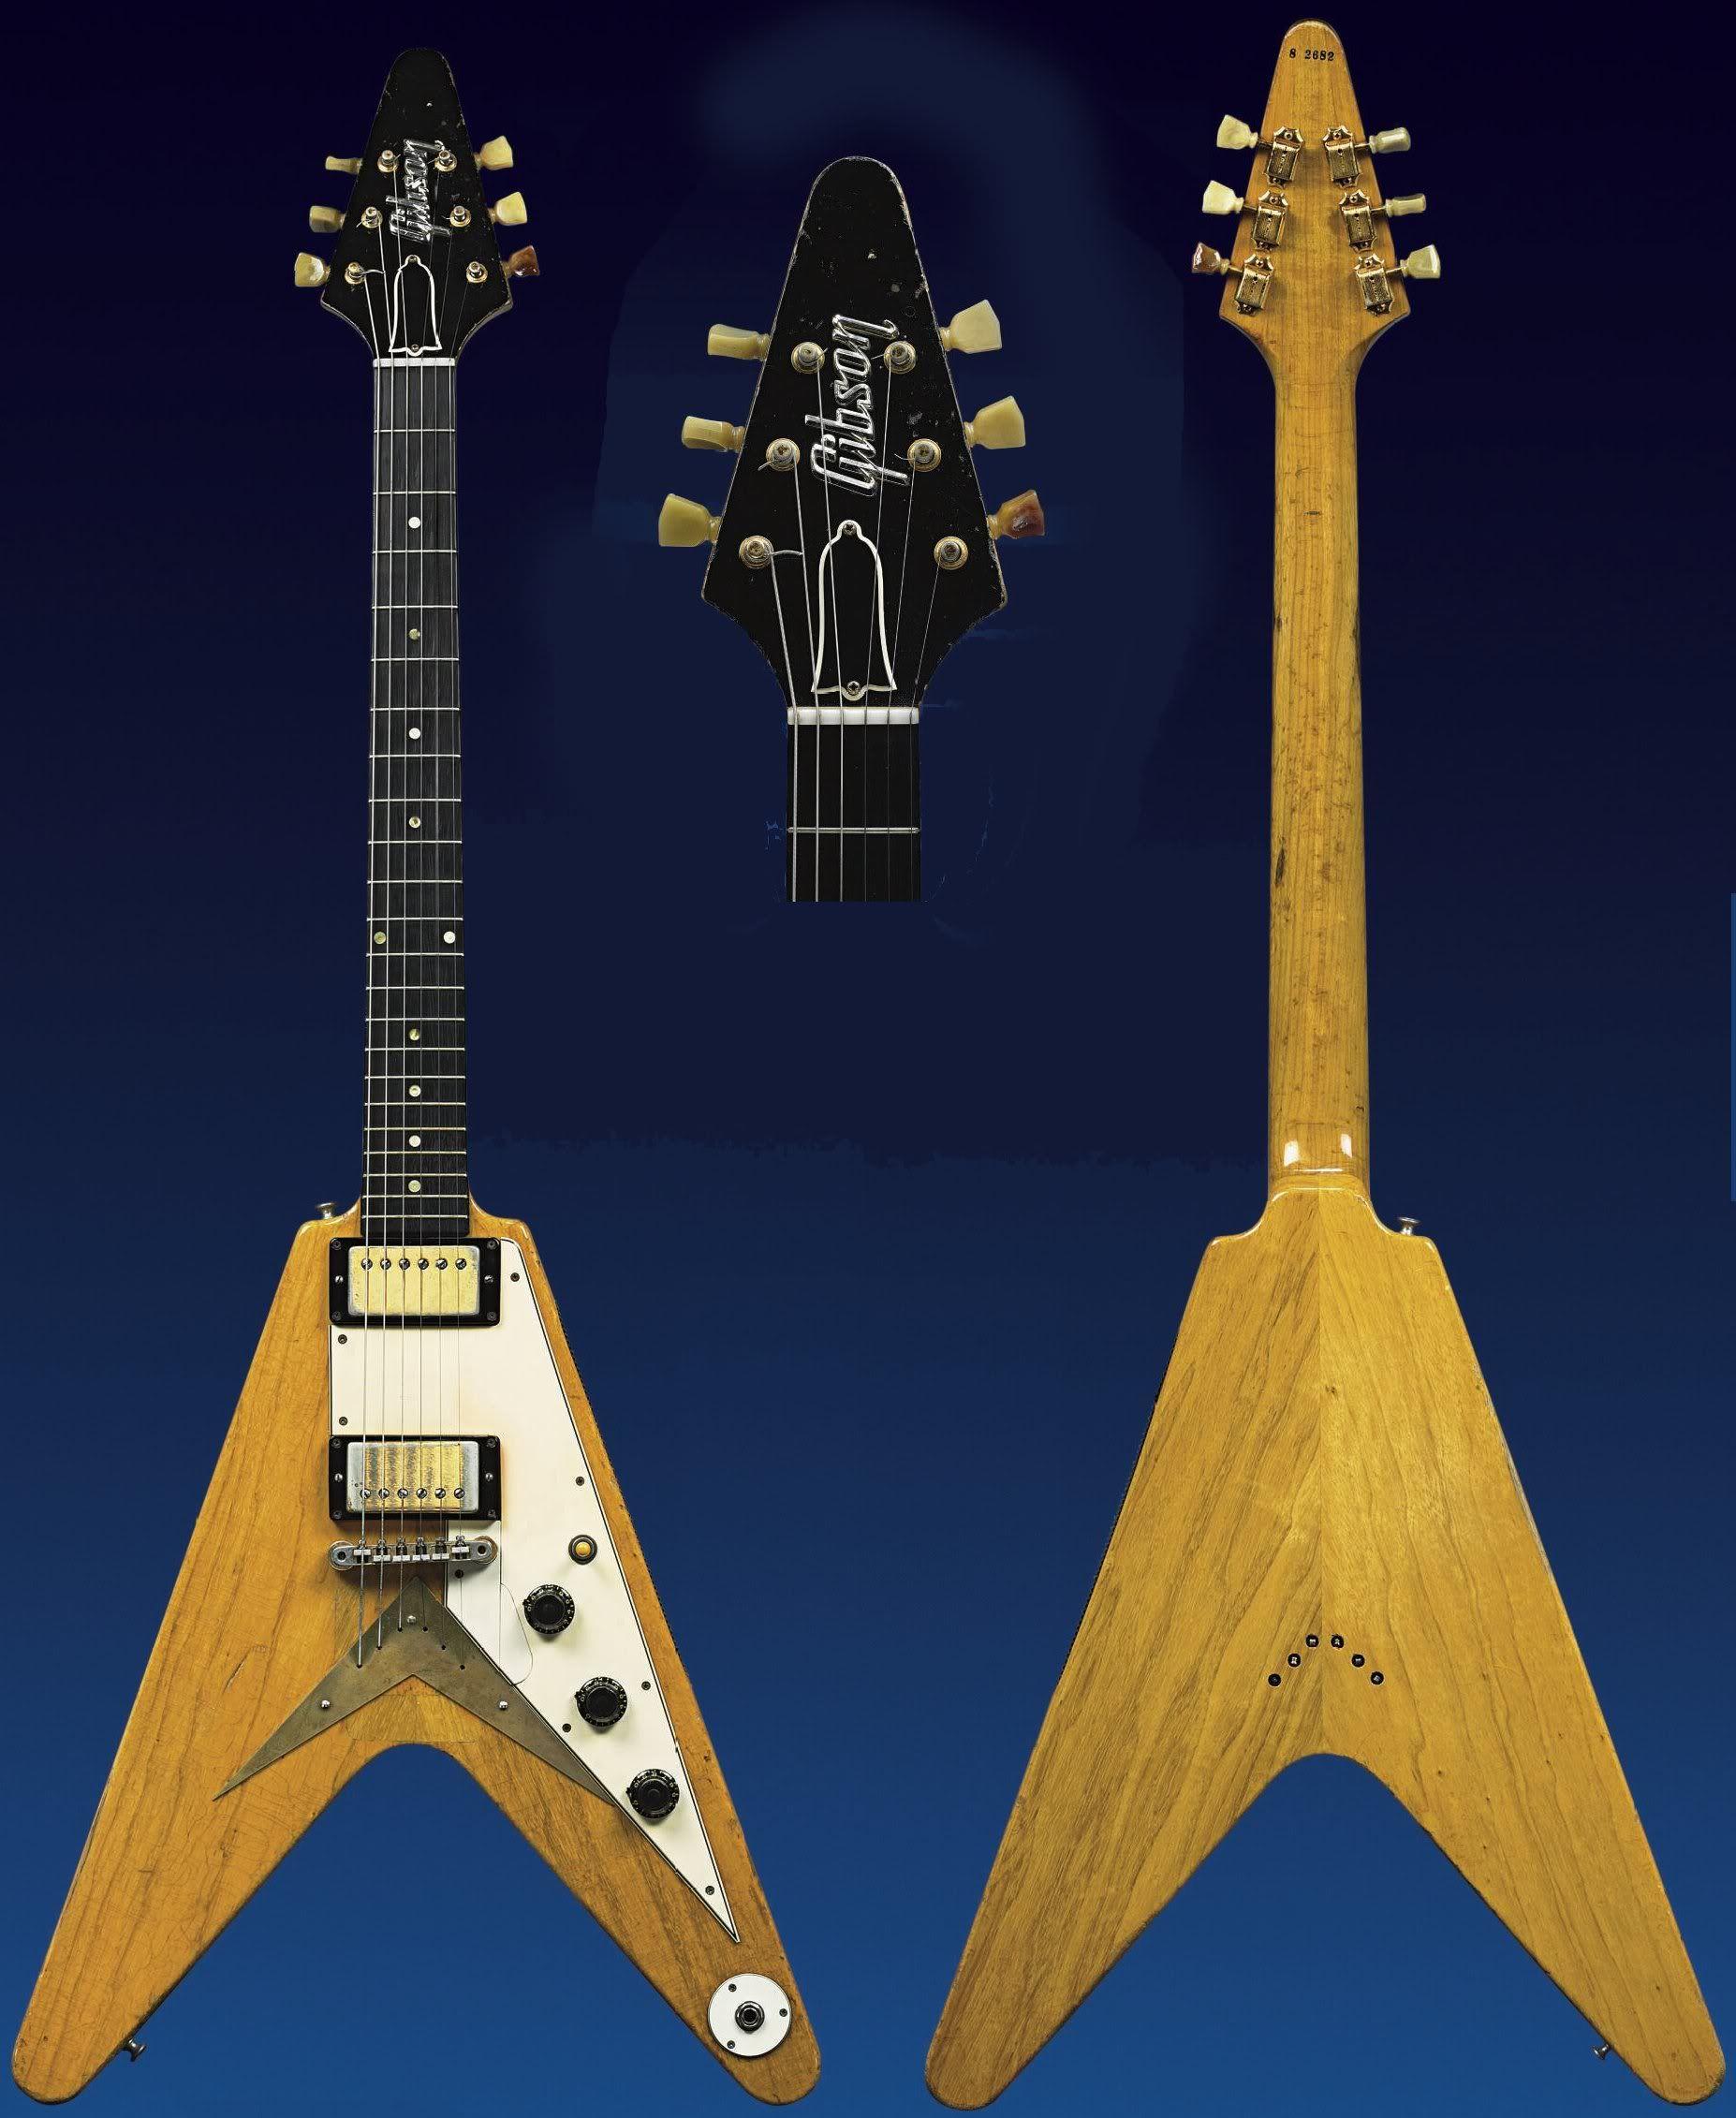 gibson 58 39 flying v making music in 2019 gibson electric guitar vintage guitars gibson guitars. Black Bedroom Furniture Sets. Home Design Ideas